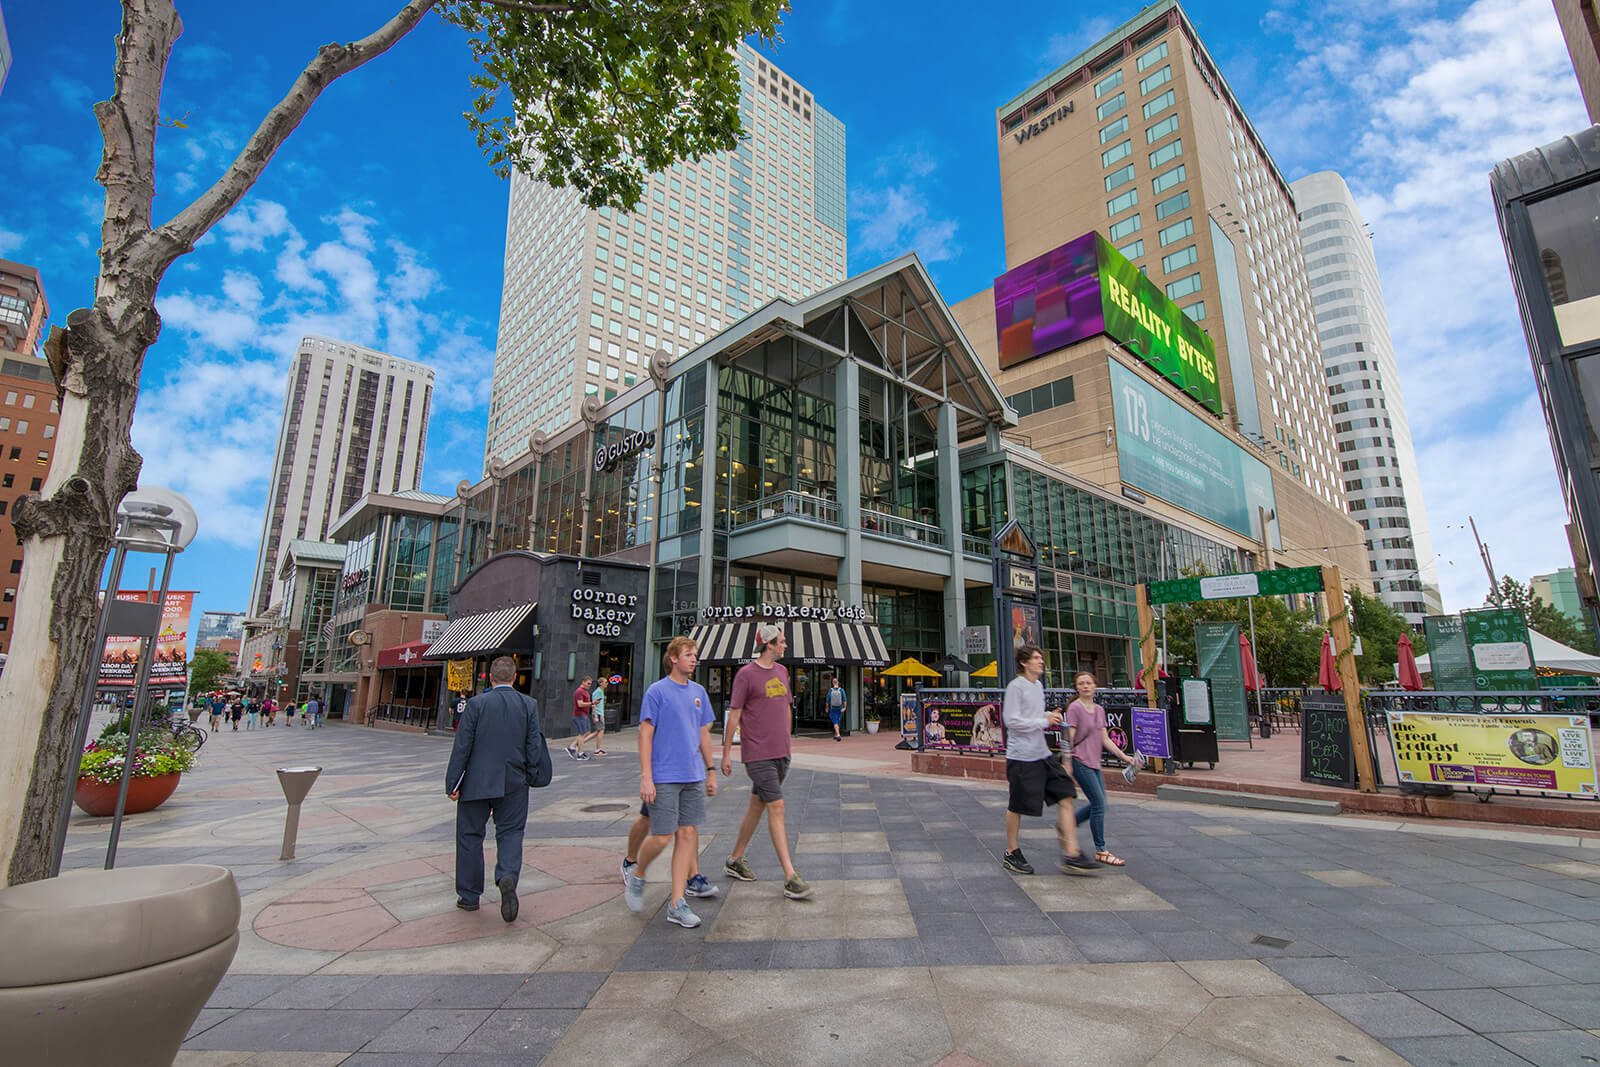 Endless Options for Shopping Exploring and Entertainment near The Casey, Denver, Colorado